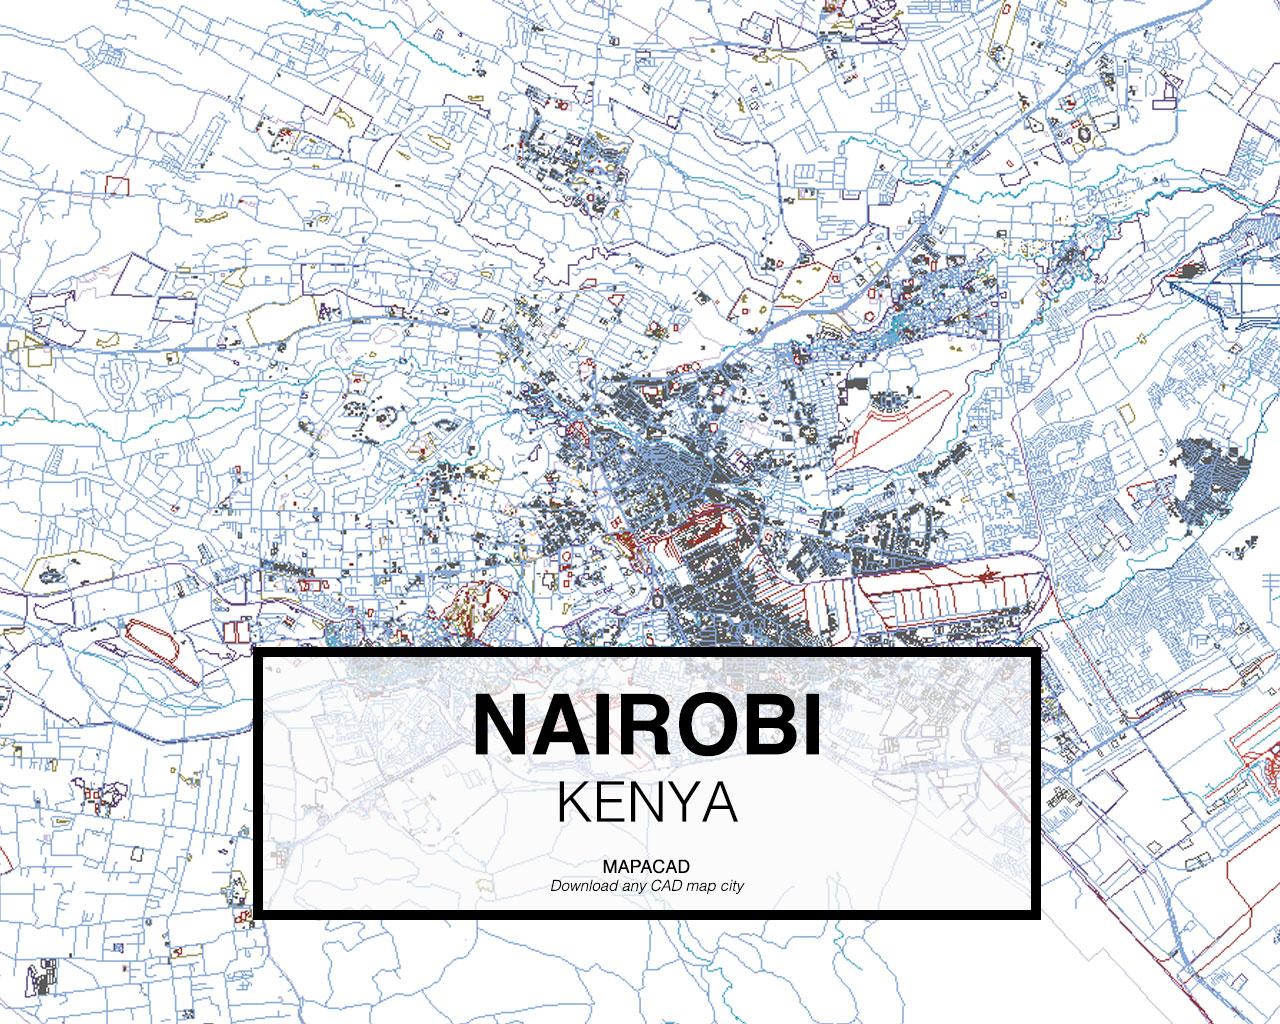 Download nairobi dwg mapacad nairobi kenya 01 mapacad download map cad dwg gumiabroncs Image collections